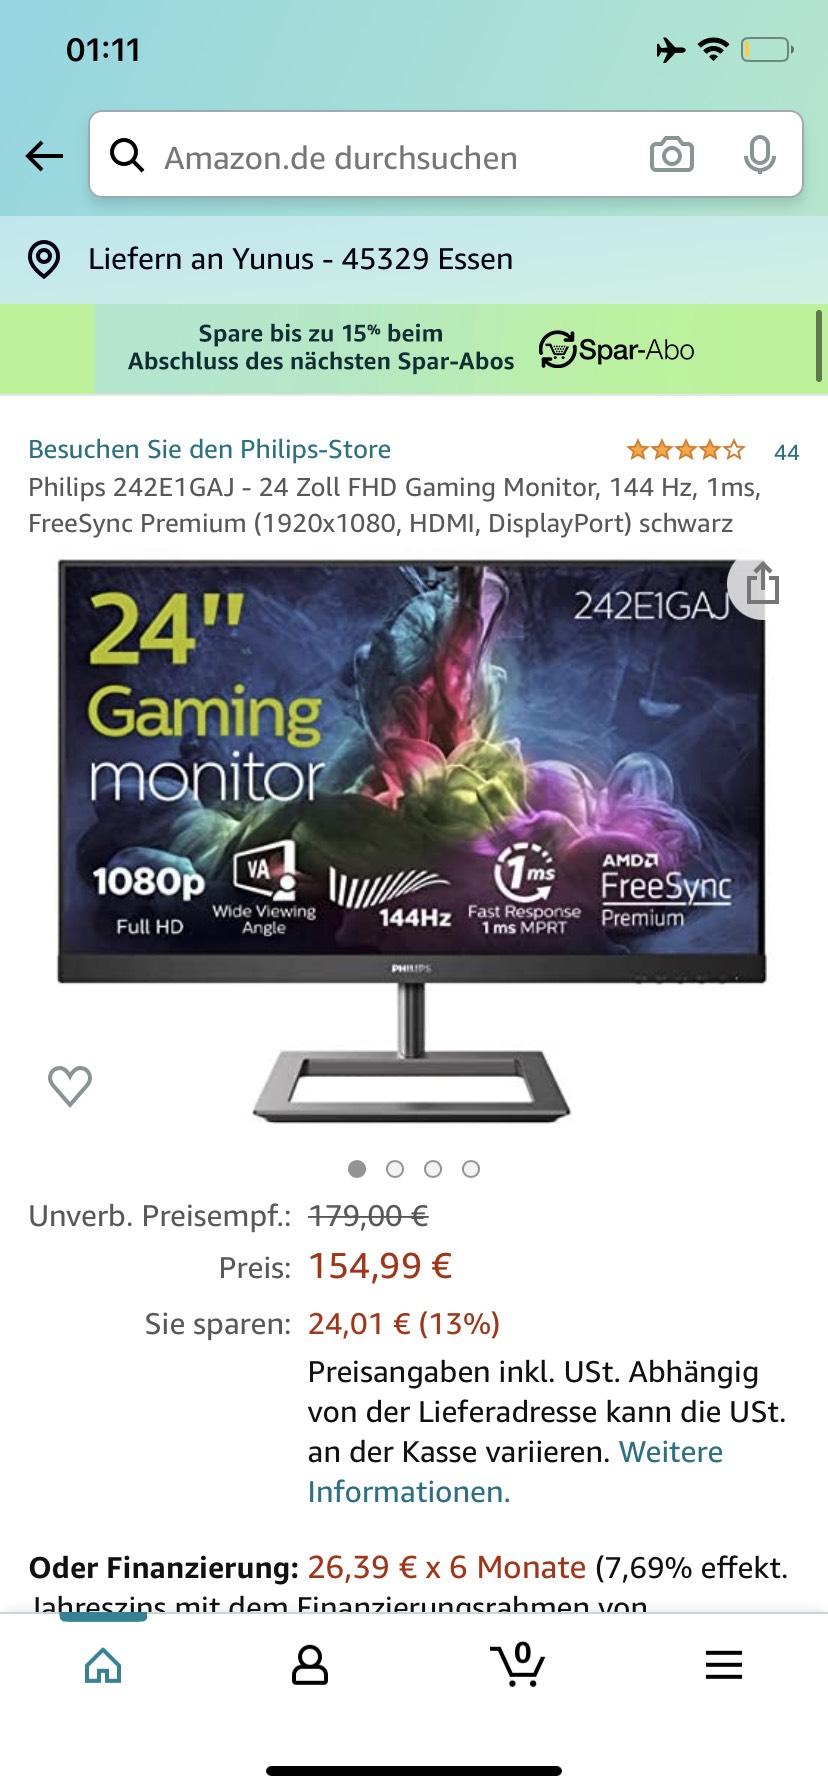 Philips 242E1GAJ - 24 Zoll FHD Gaming Monitor